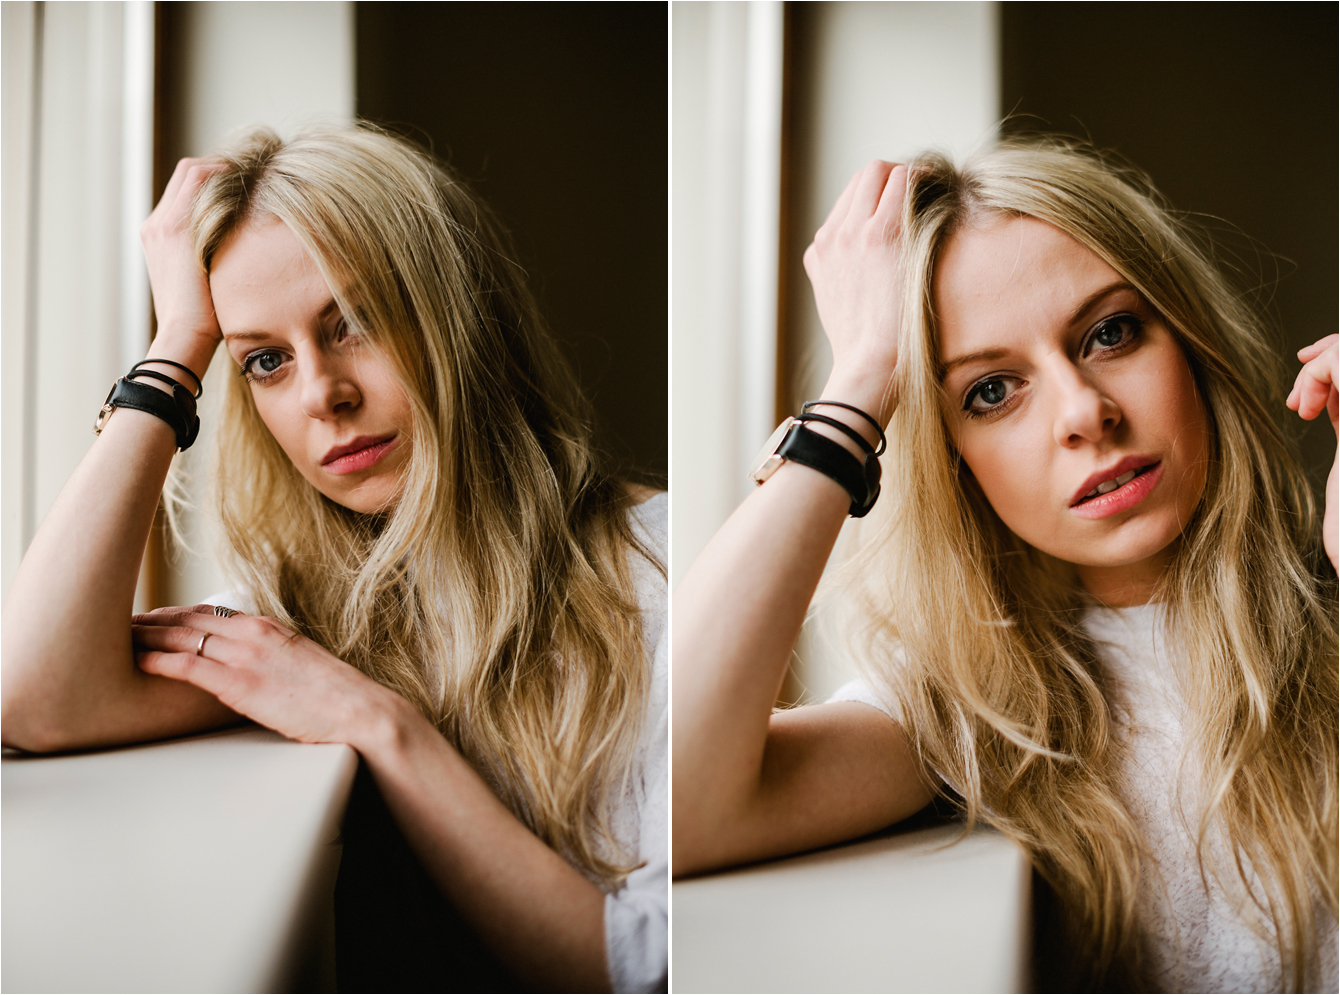 Creative Model Portraits